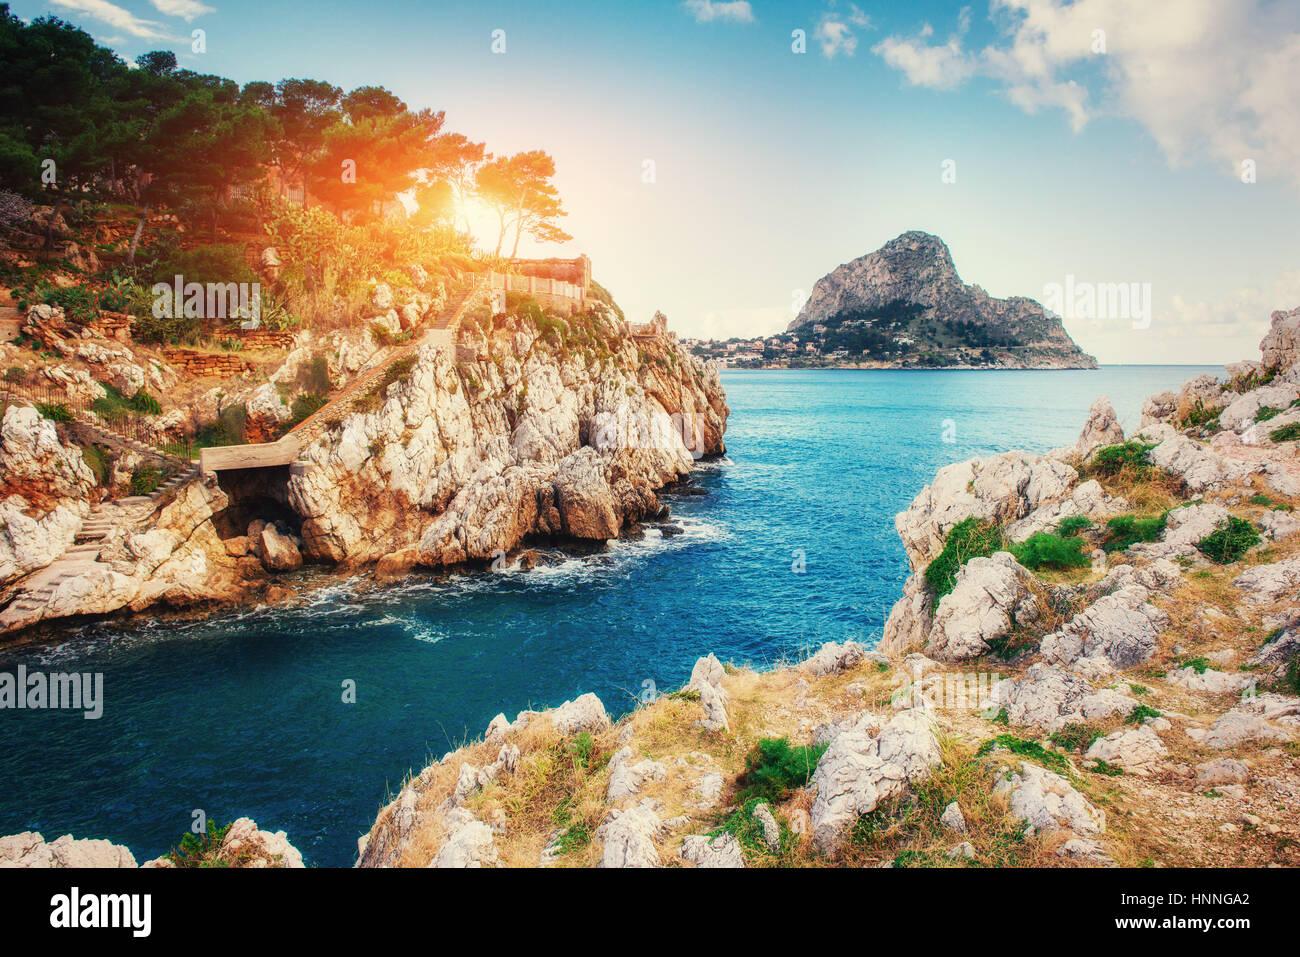 Malerische Felsenküste Kap Milazzo. Sizilien-Italien Stockbild